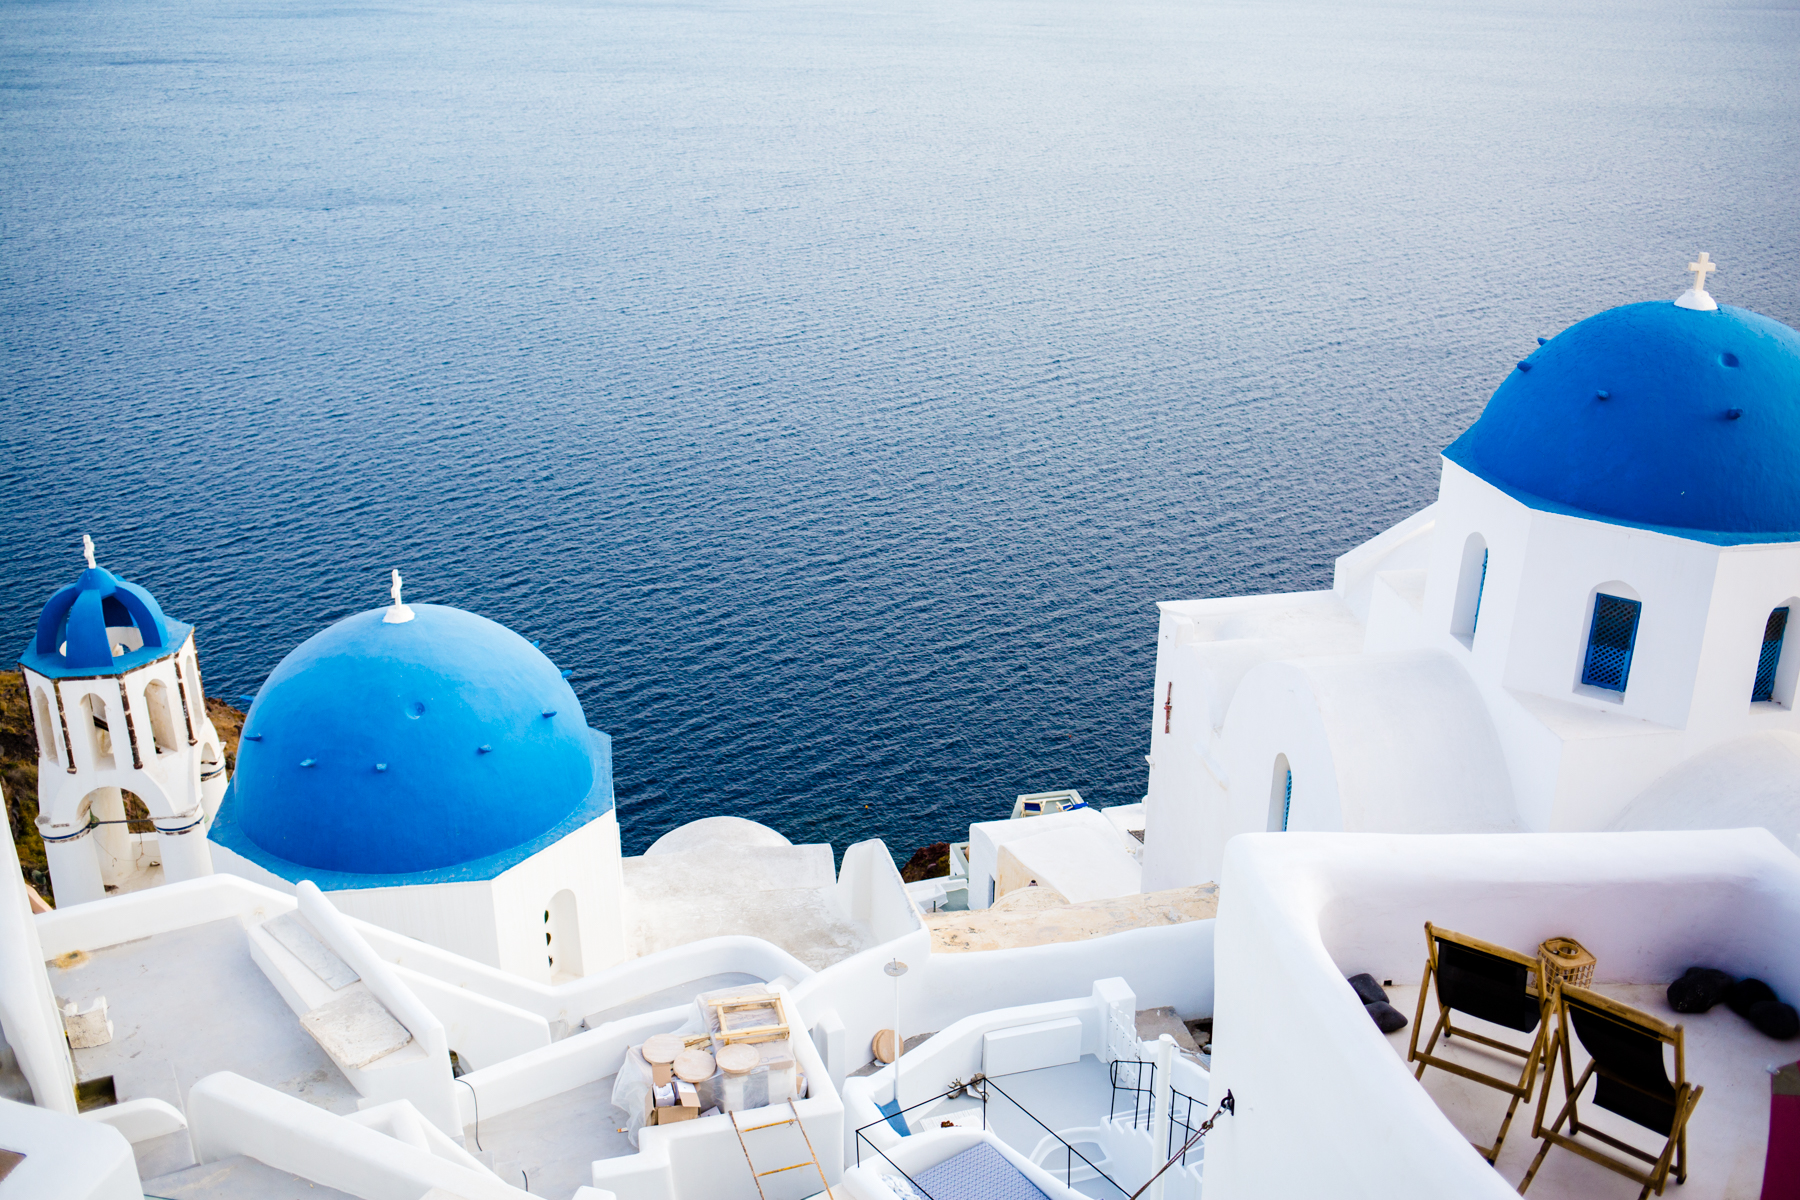 LLG Events_Greece_Destination Weddings_420.jpg